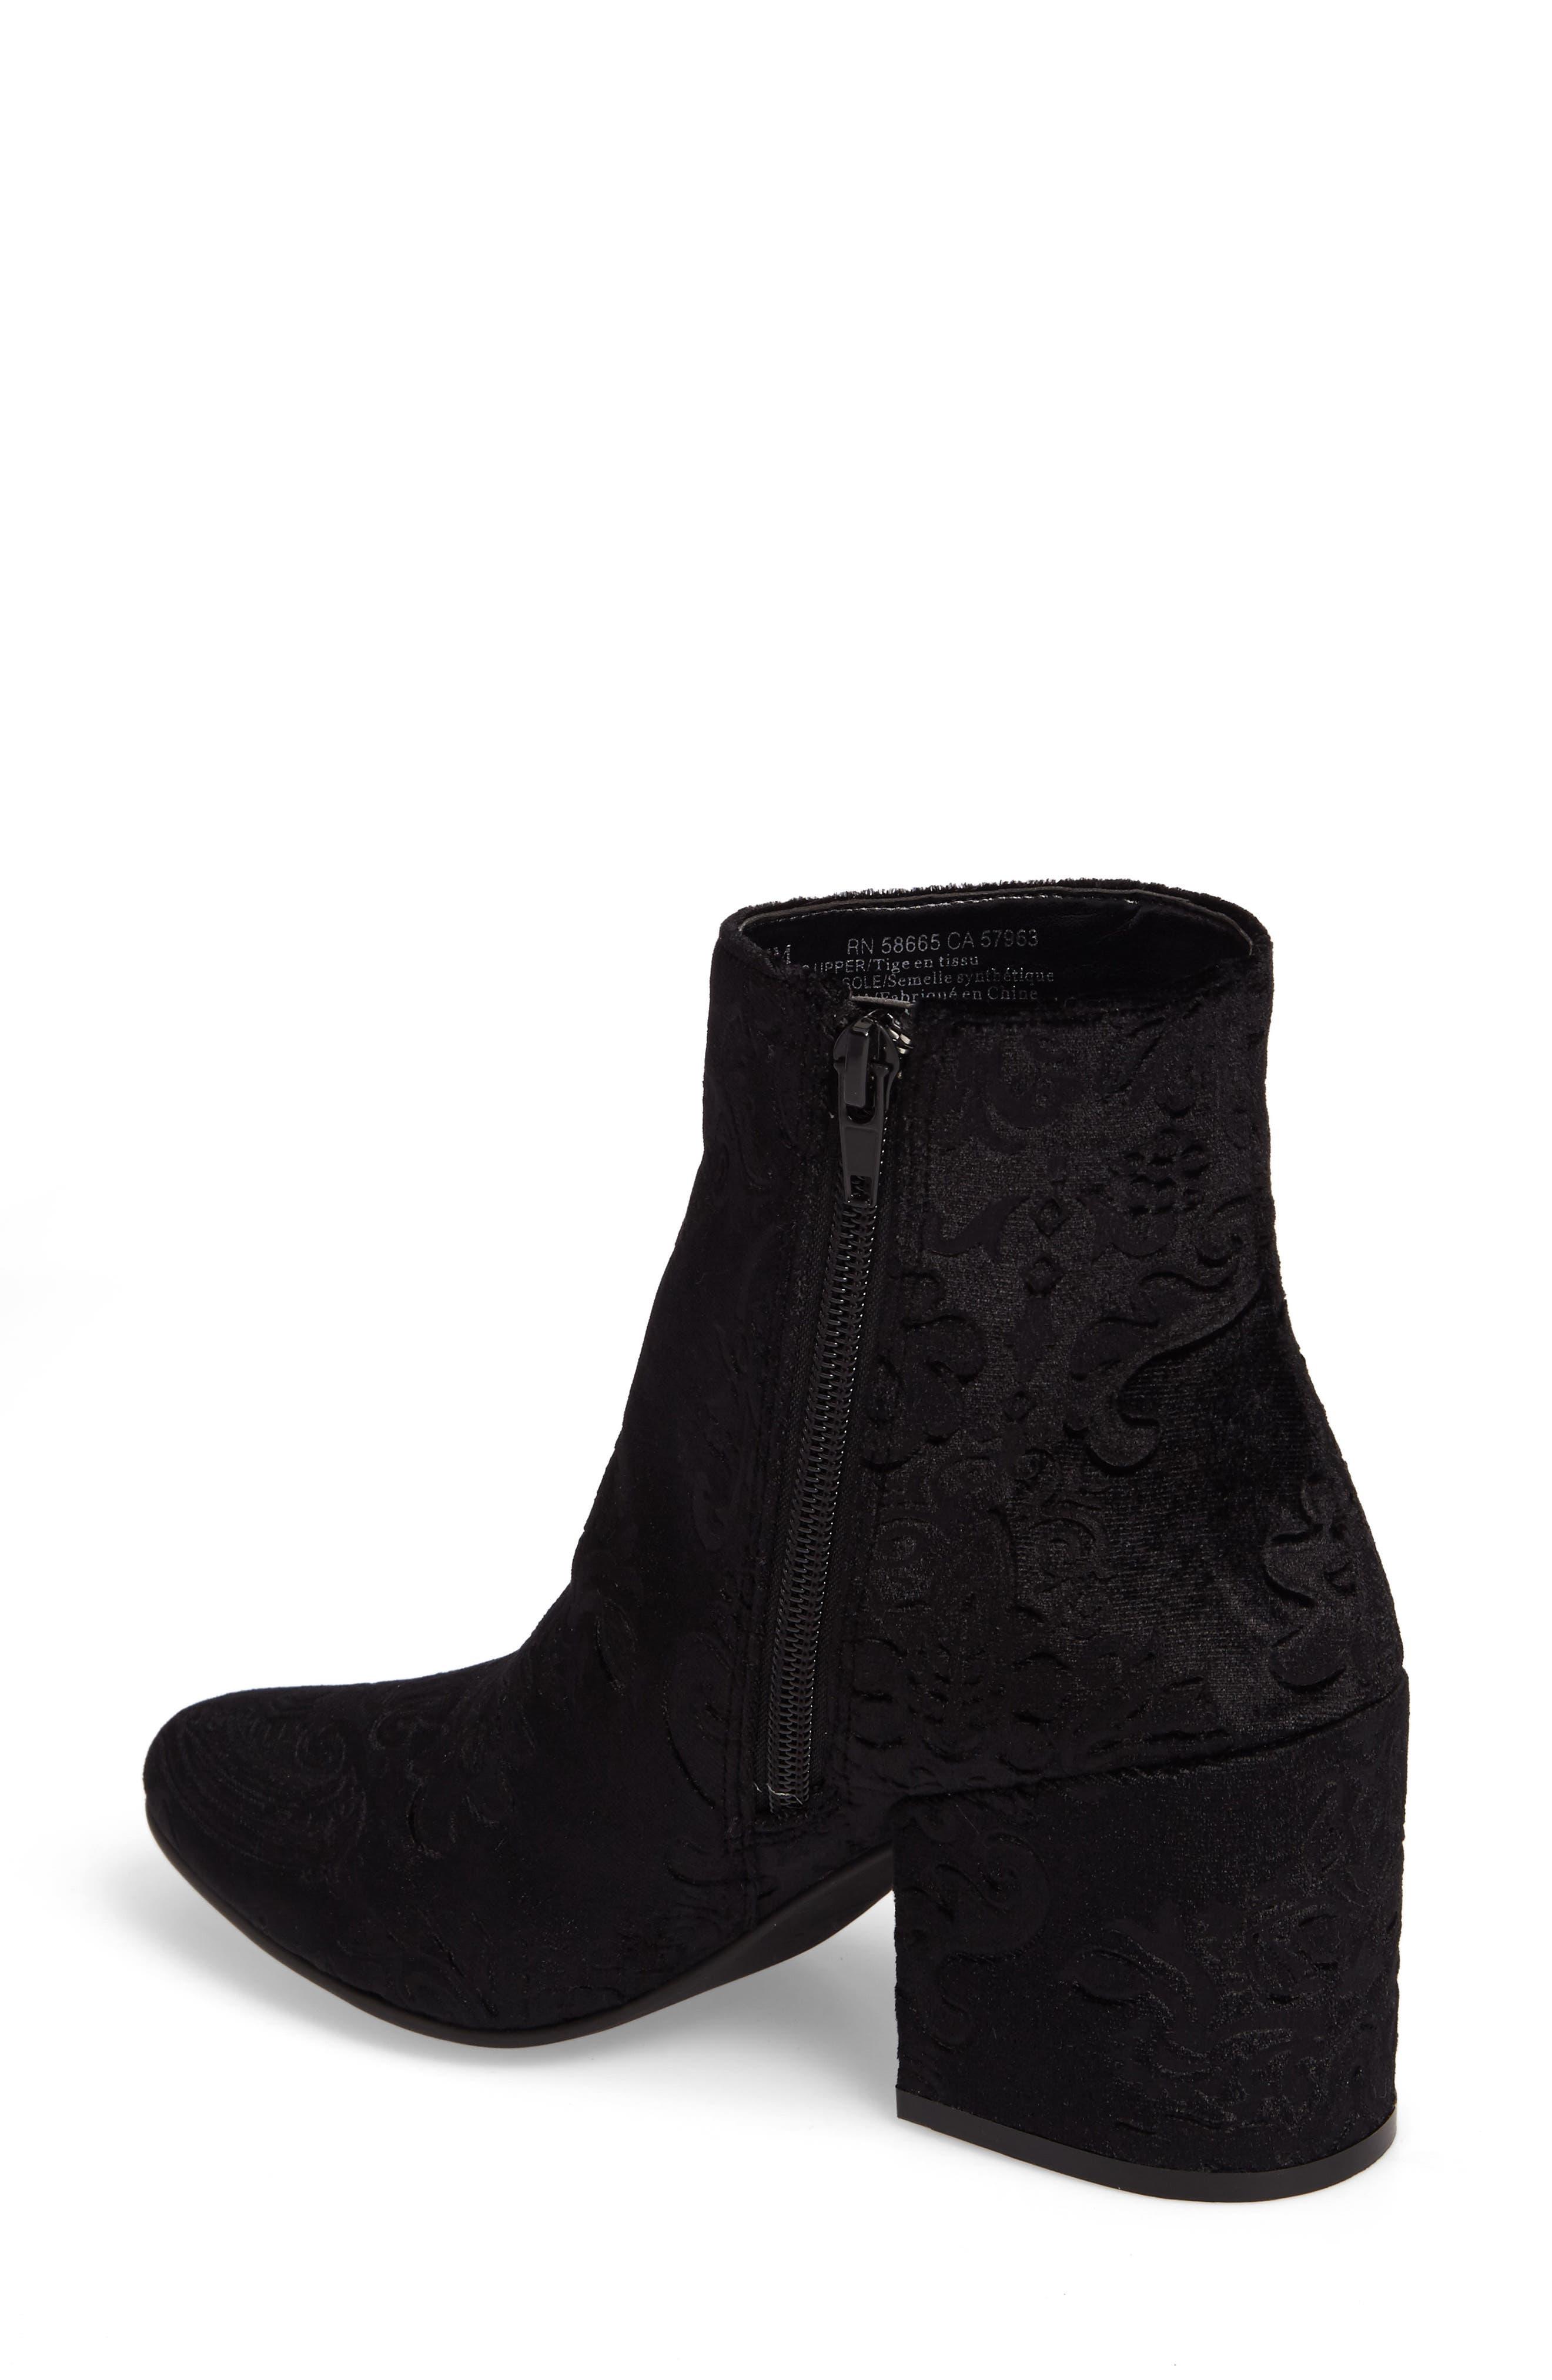 Marian Block Heel Bootie,                             Alternate thumbnail 2, color,                             Black Embossed Velvet